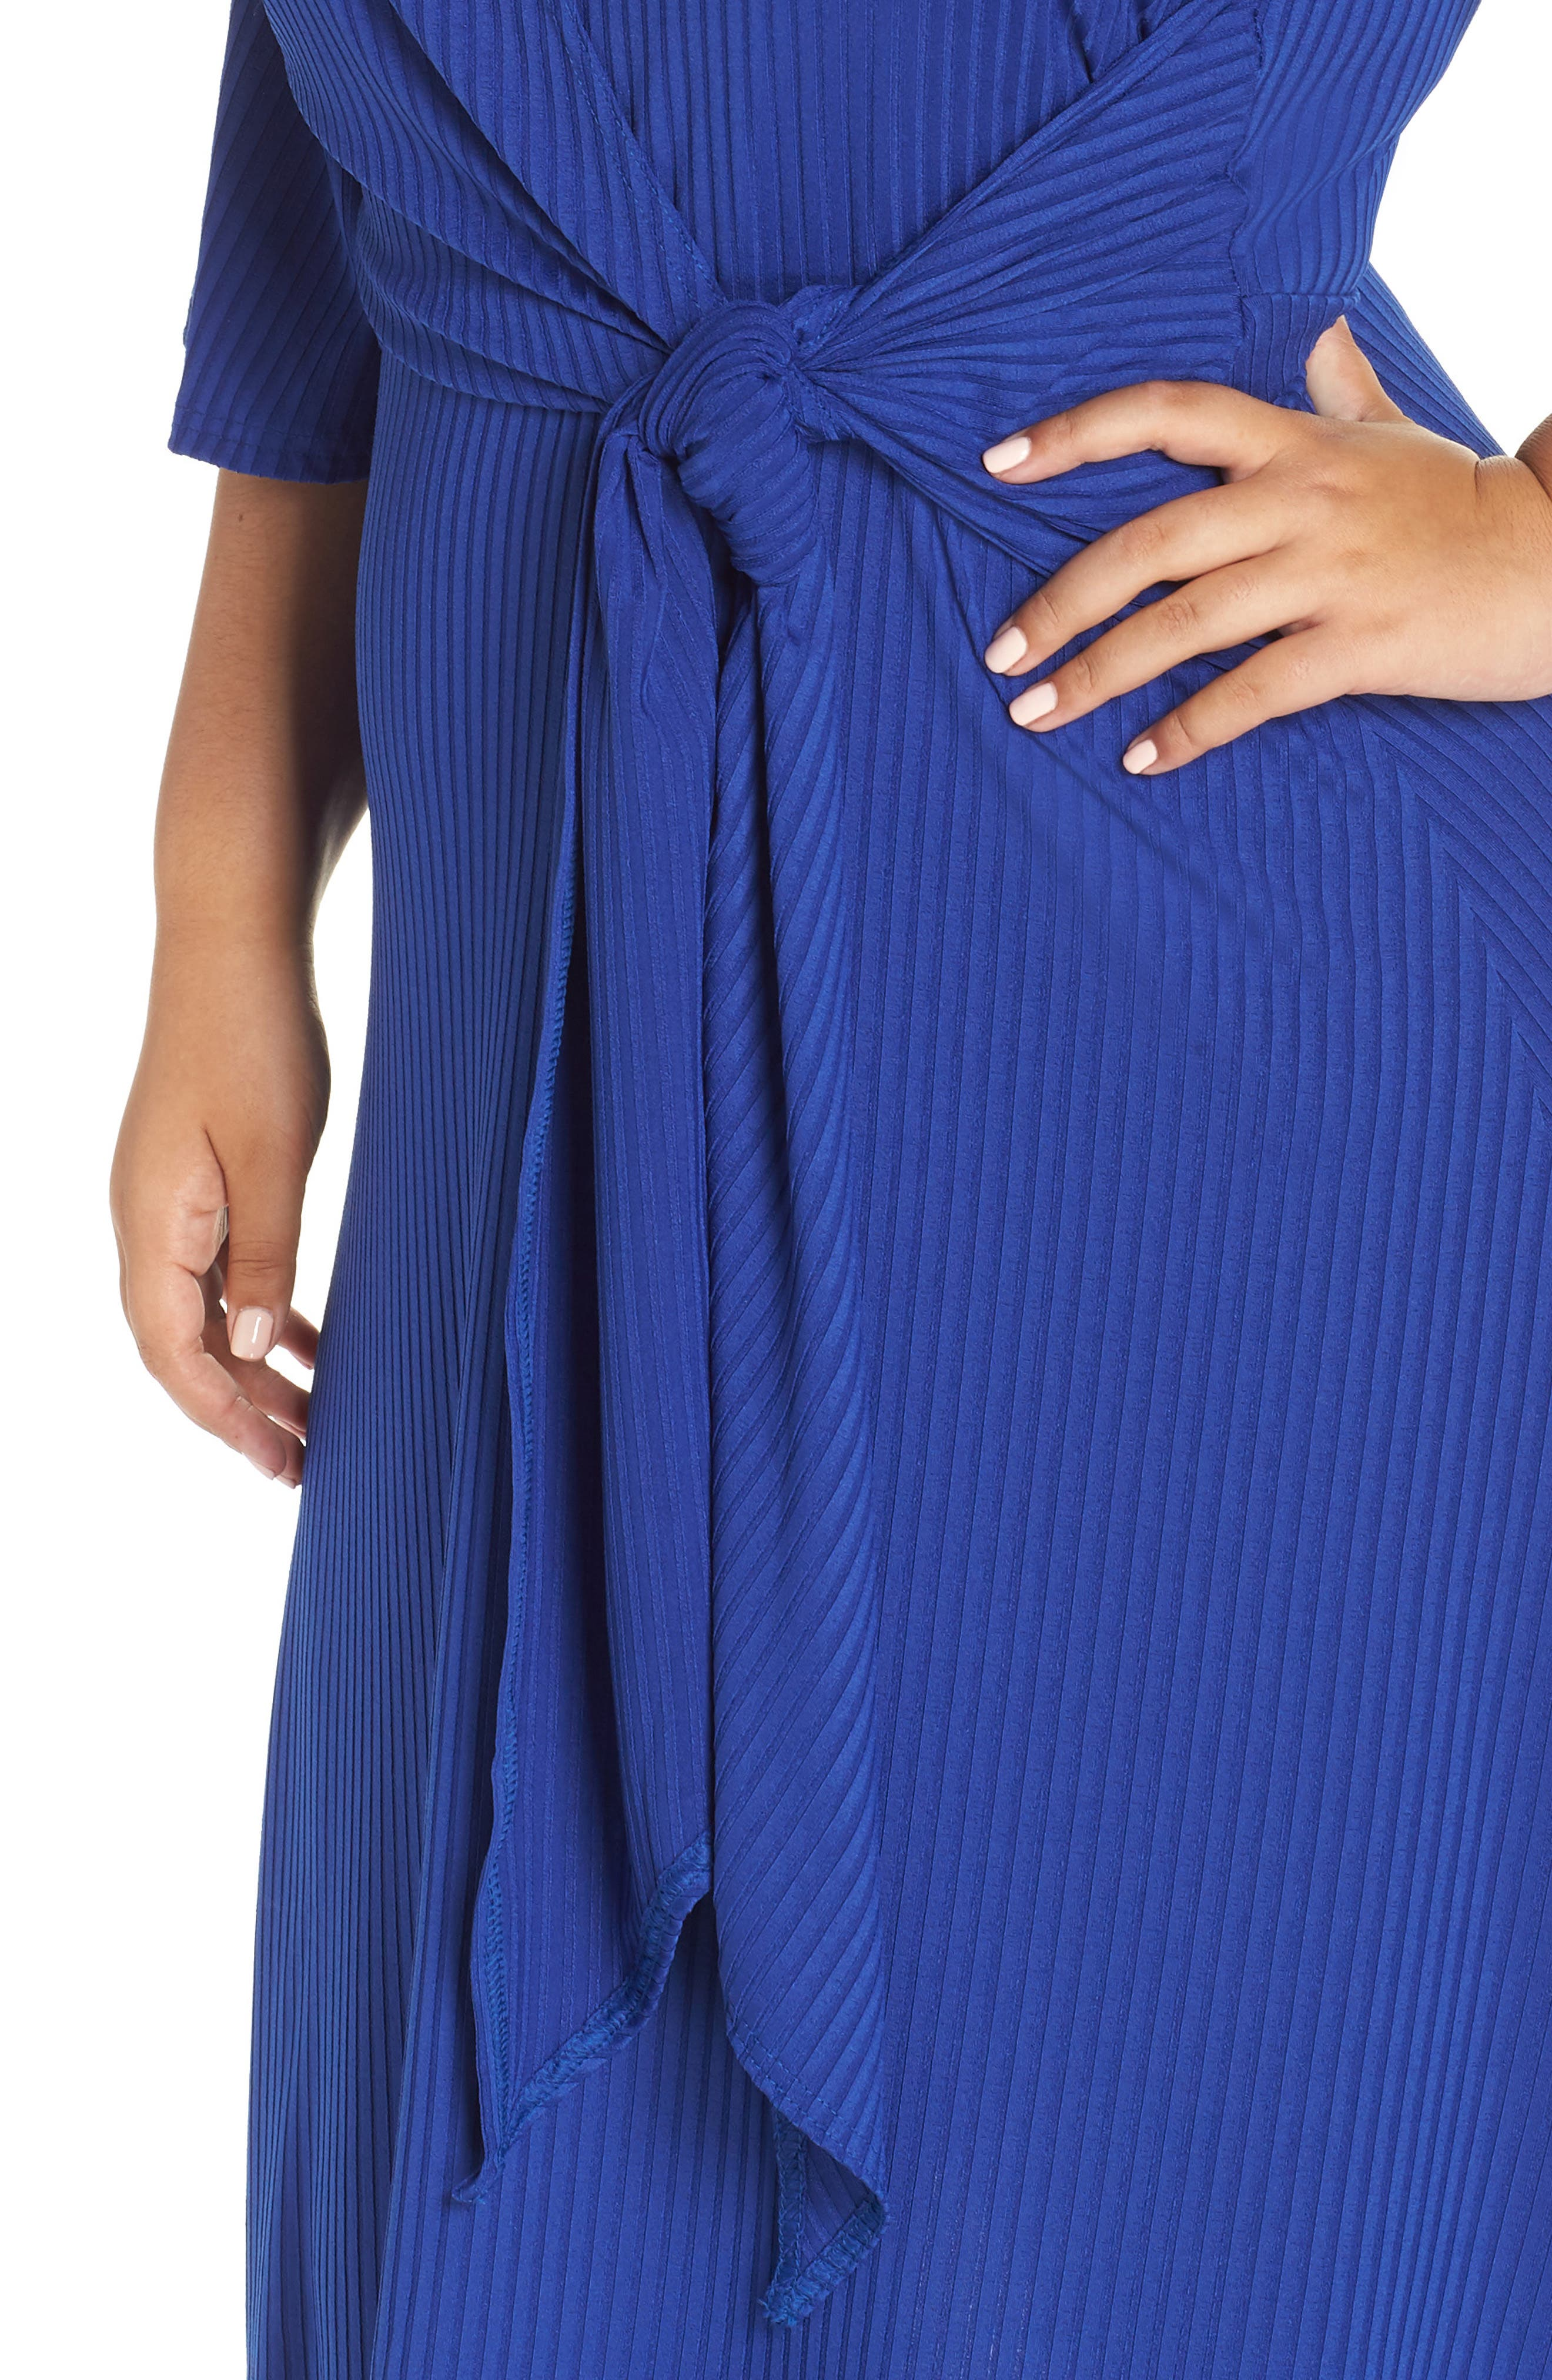 Ribbed Knit Skater Dress,                             Alternate thumbnail 4, color,                             BLUE